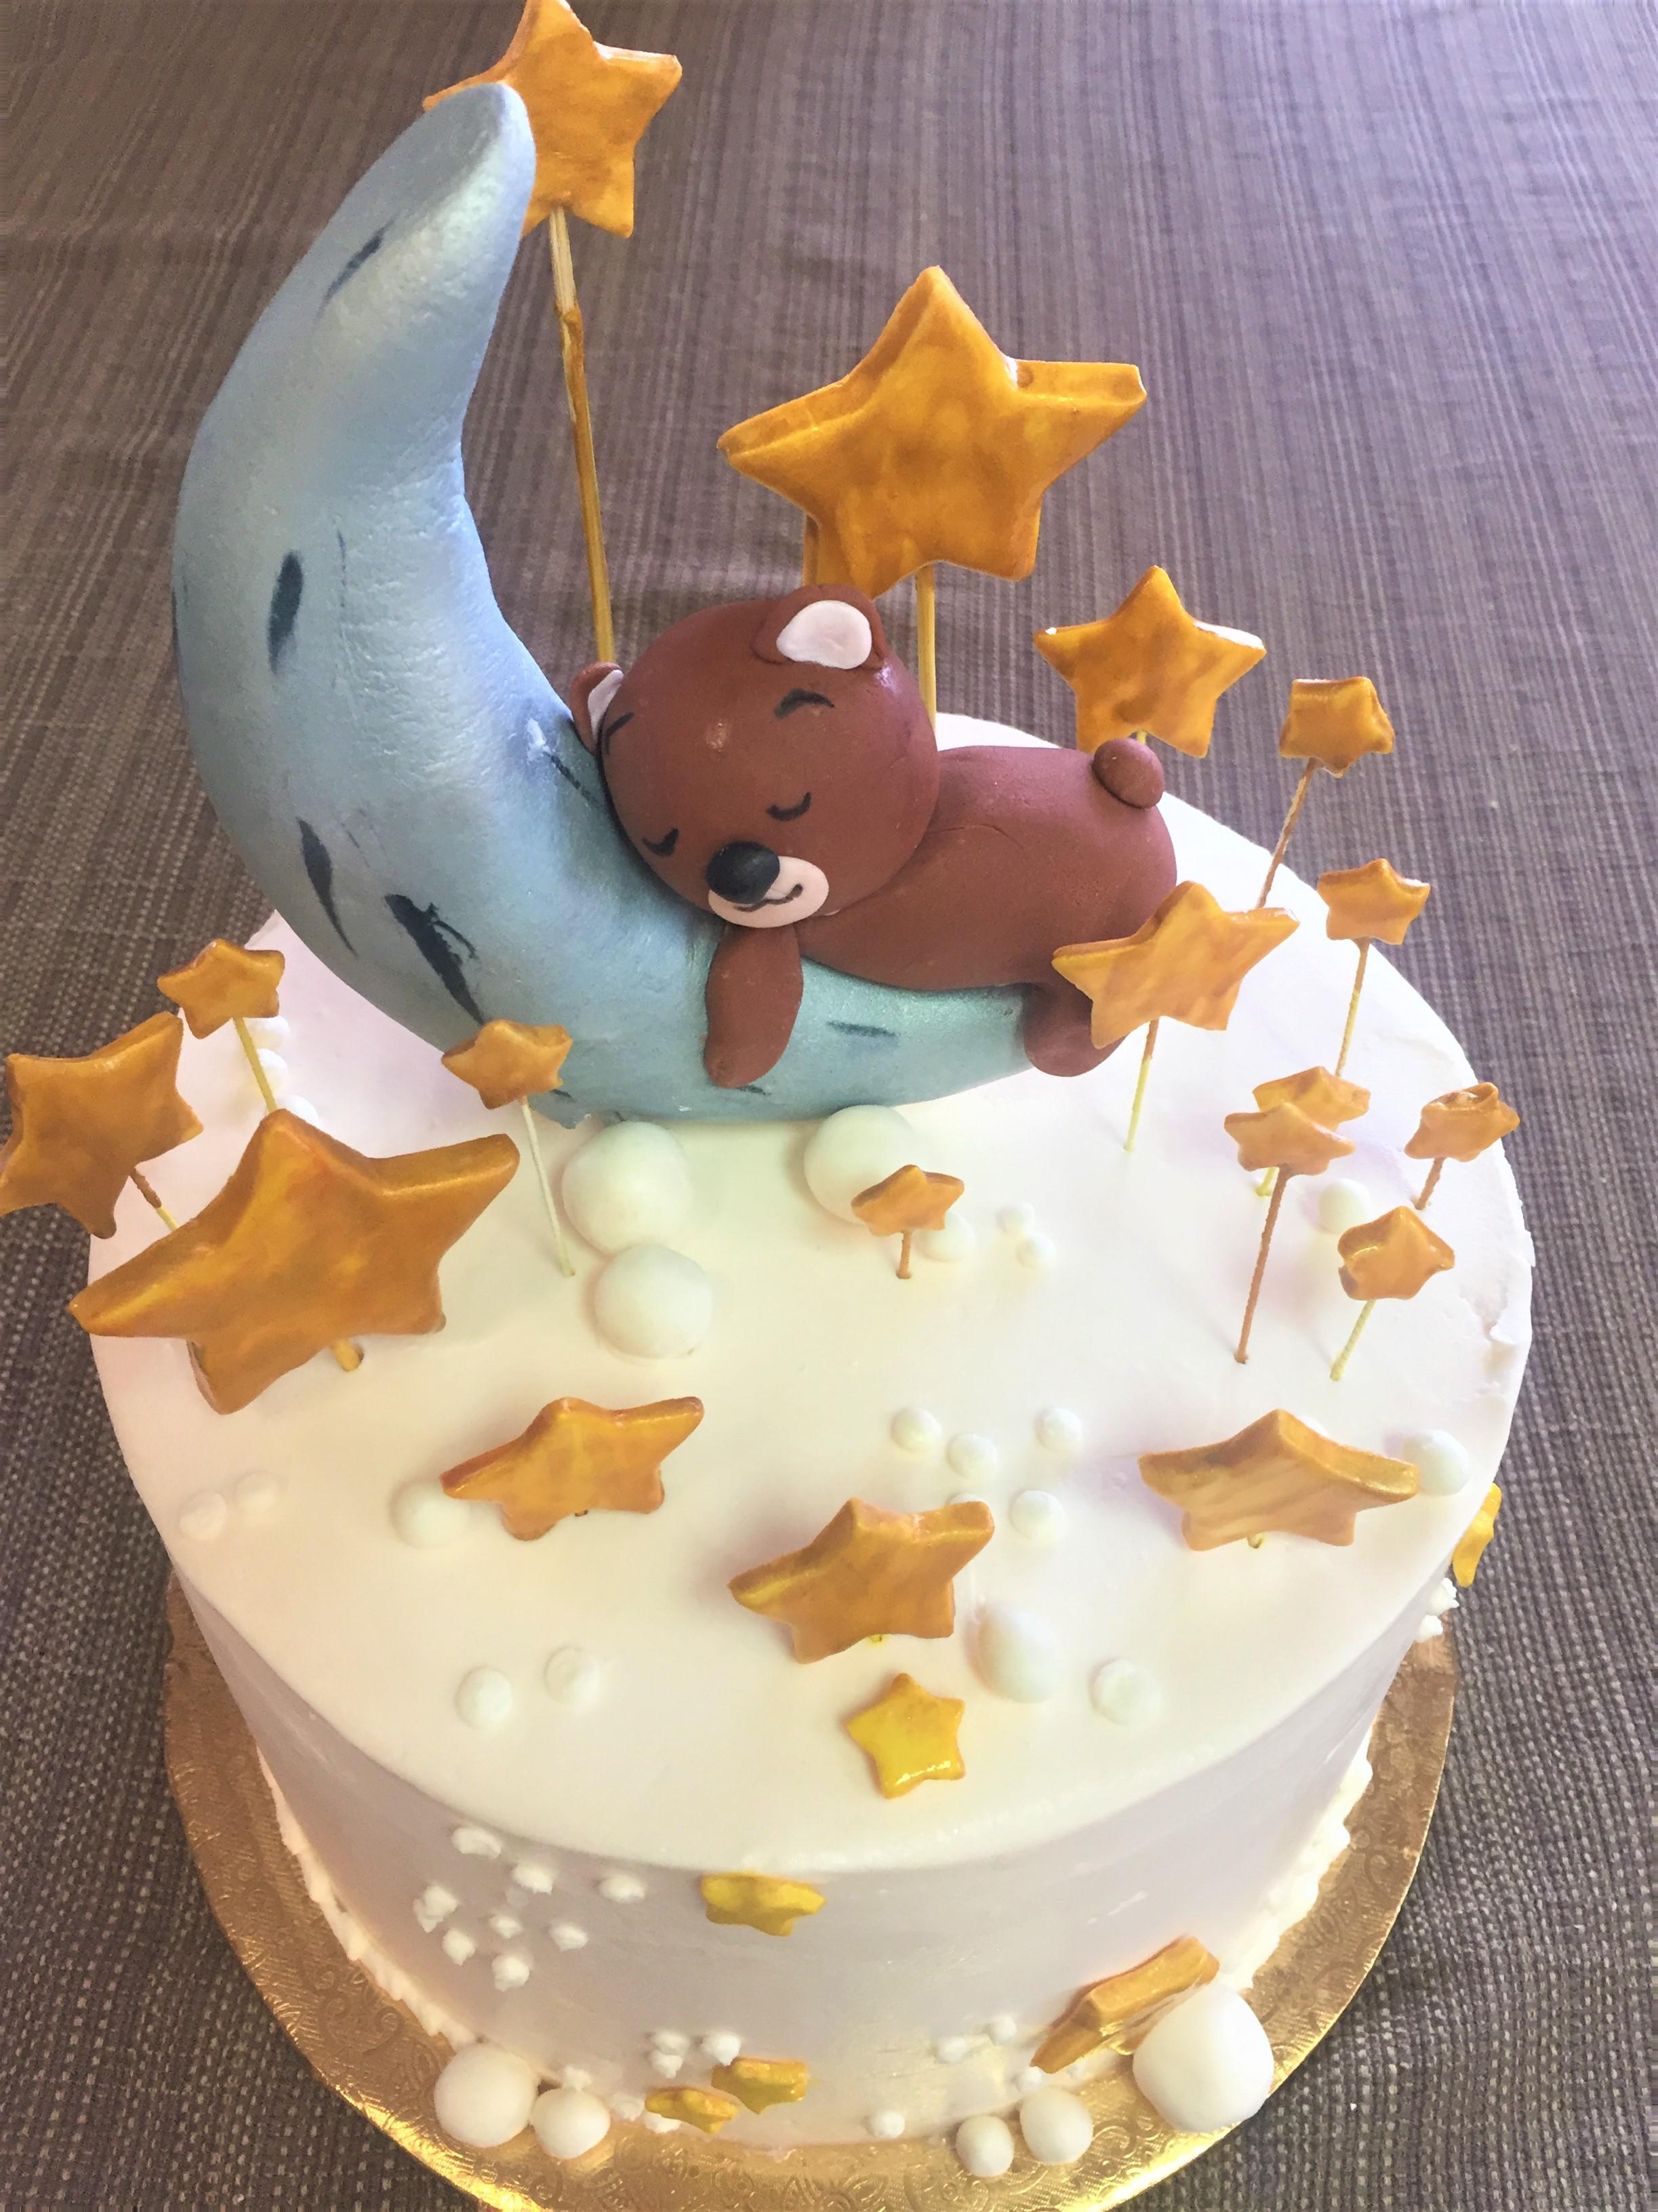 2019 Gateaux Bakery & Cafe Sleeping Bear Fondant Cake.JPG